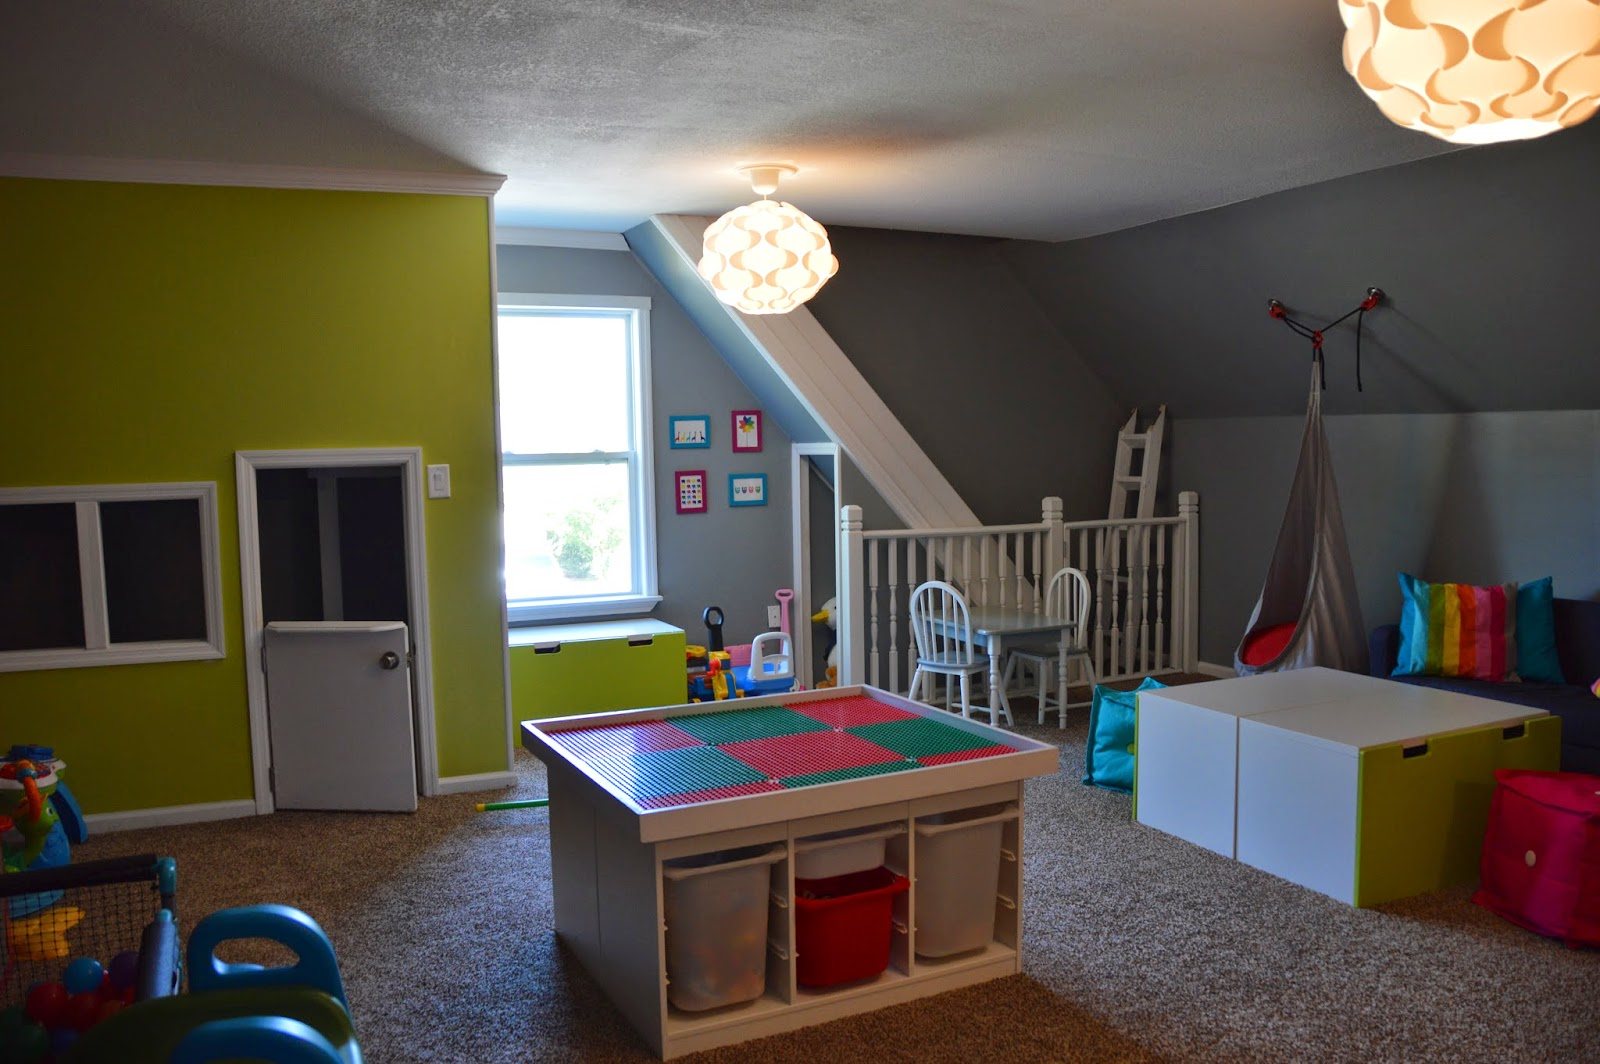 Chambre Garcon 2 Ans Ikea chambre d'enfant avec ikea kallax et stuva